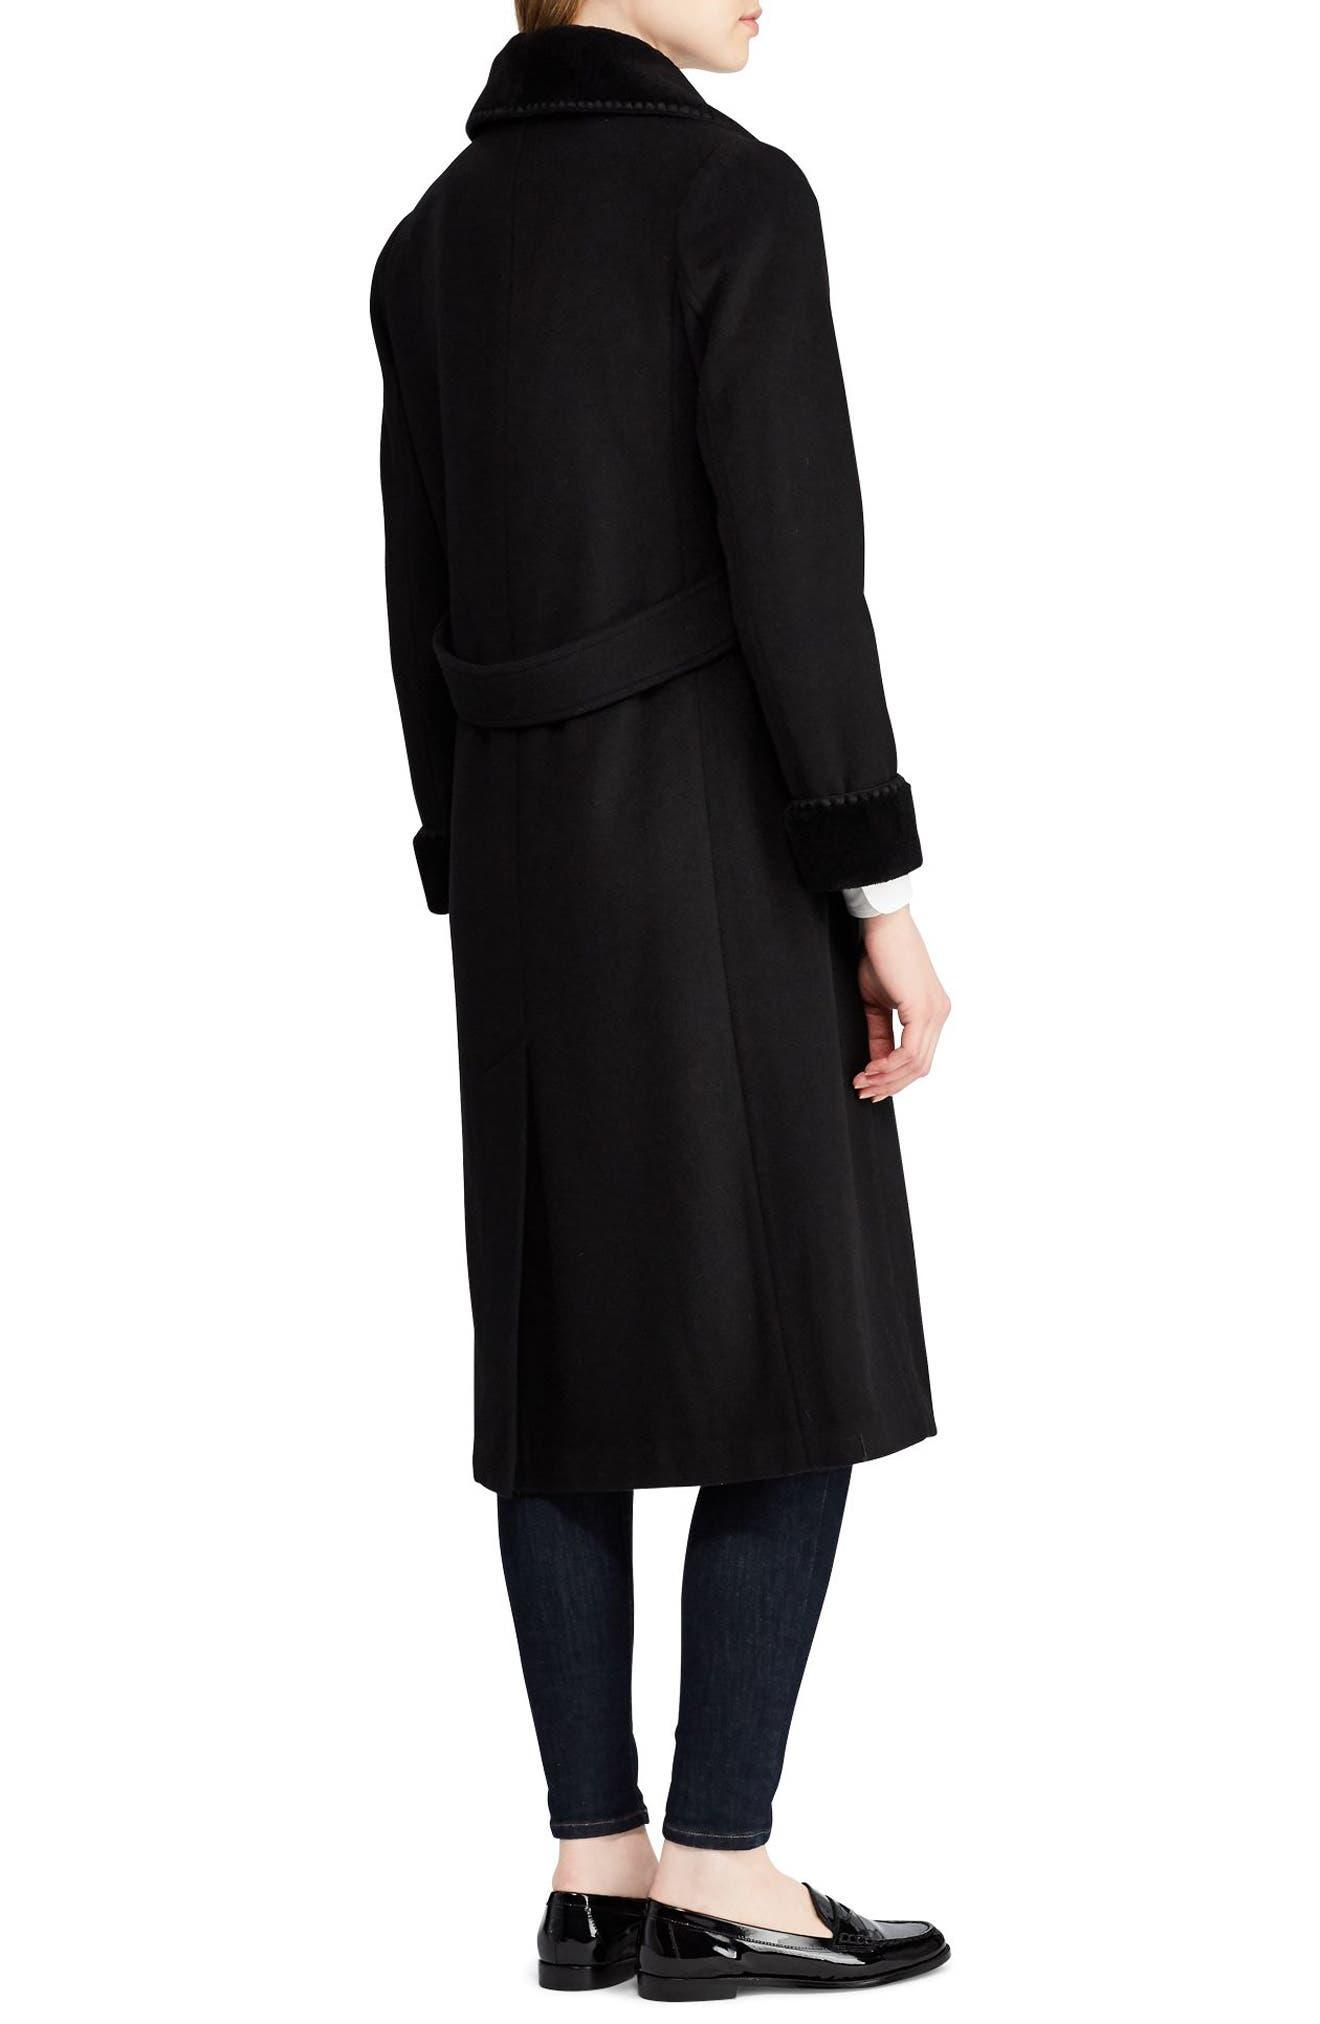 LAUREN RALPH LAUREN, Wool Blend Faux Shearling Trim Coat, Alternate thumbnail 2, color, 001